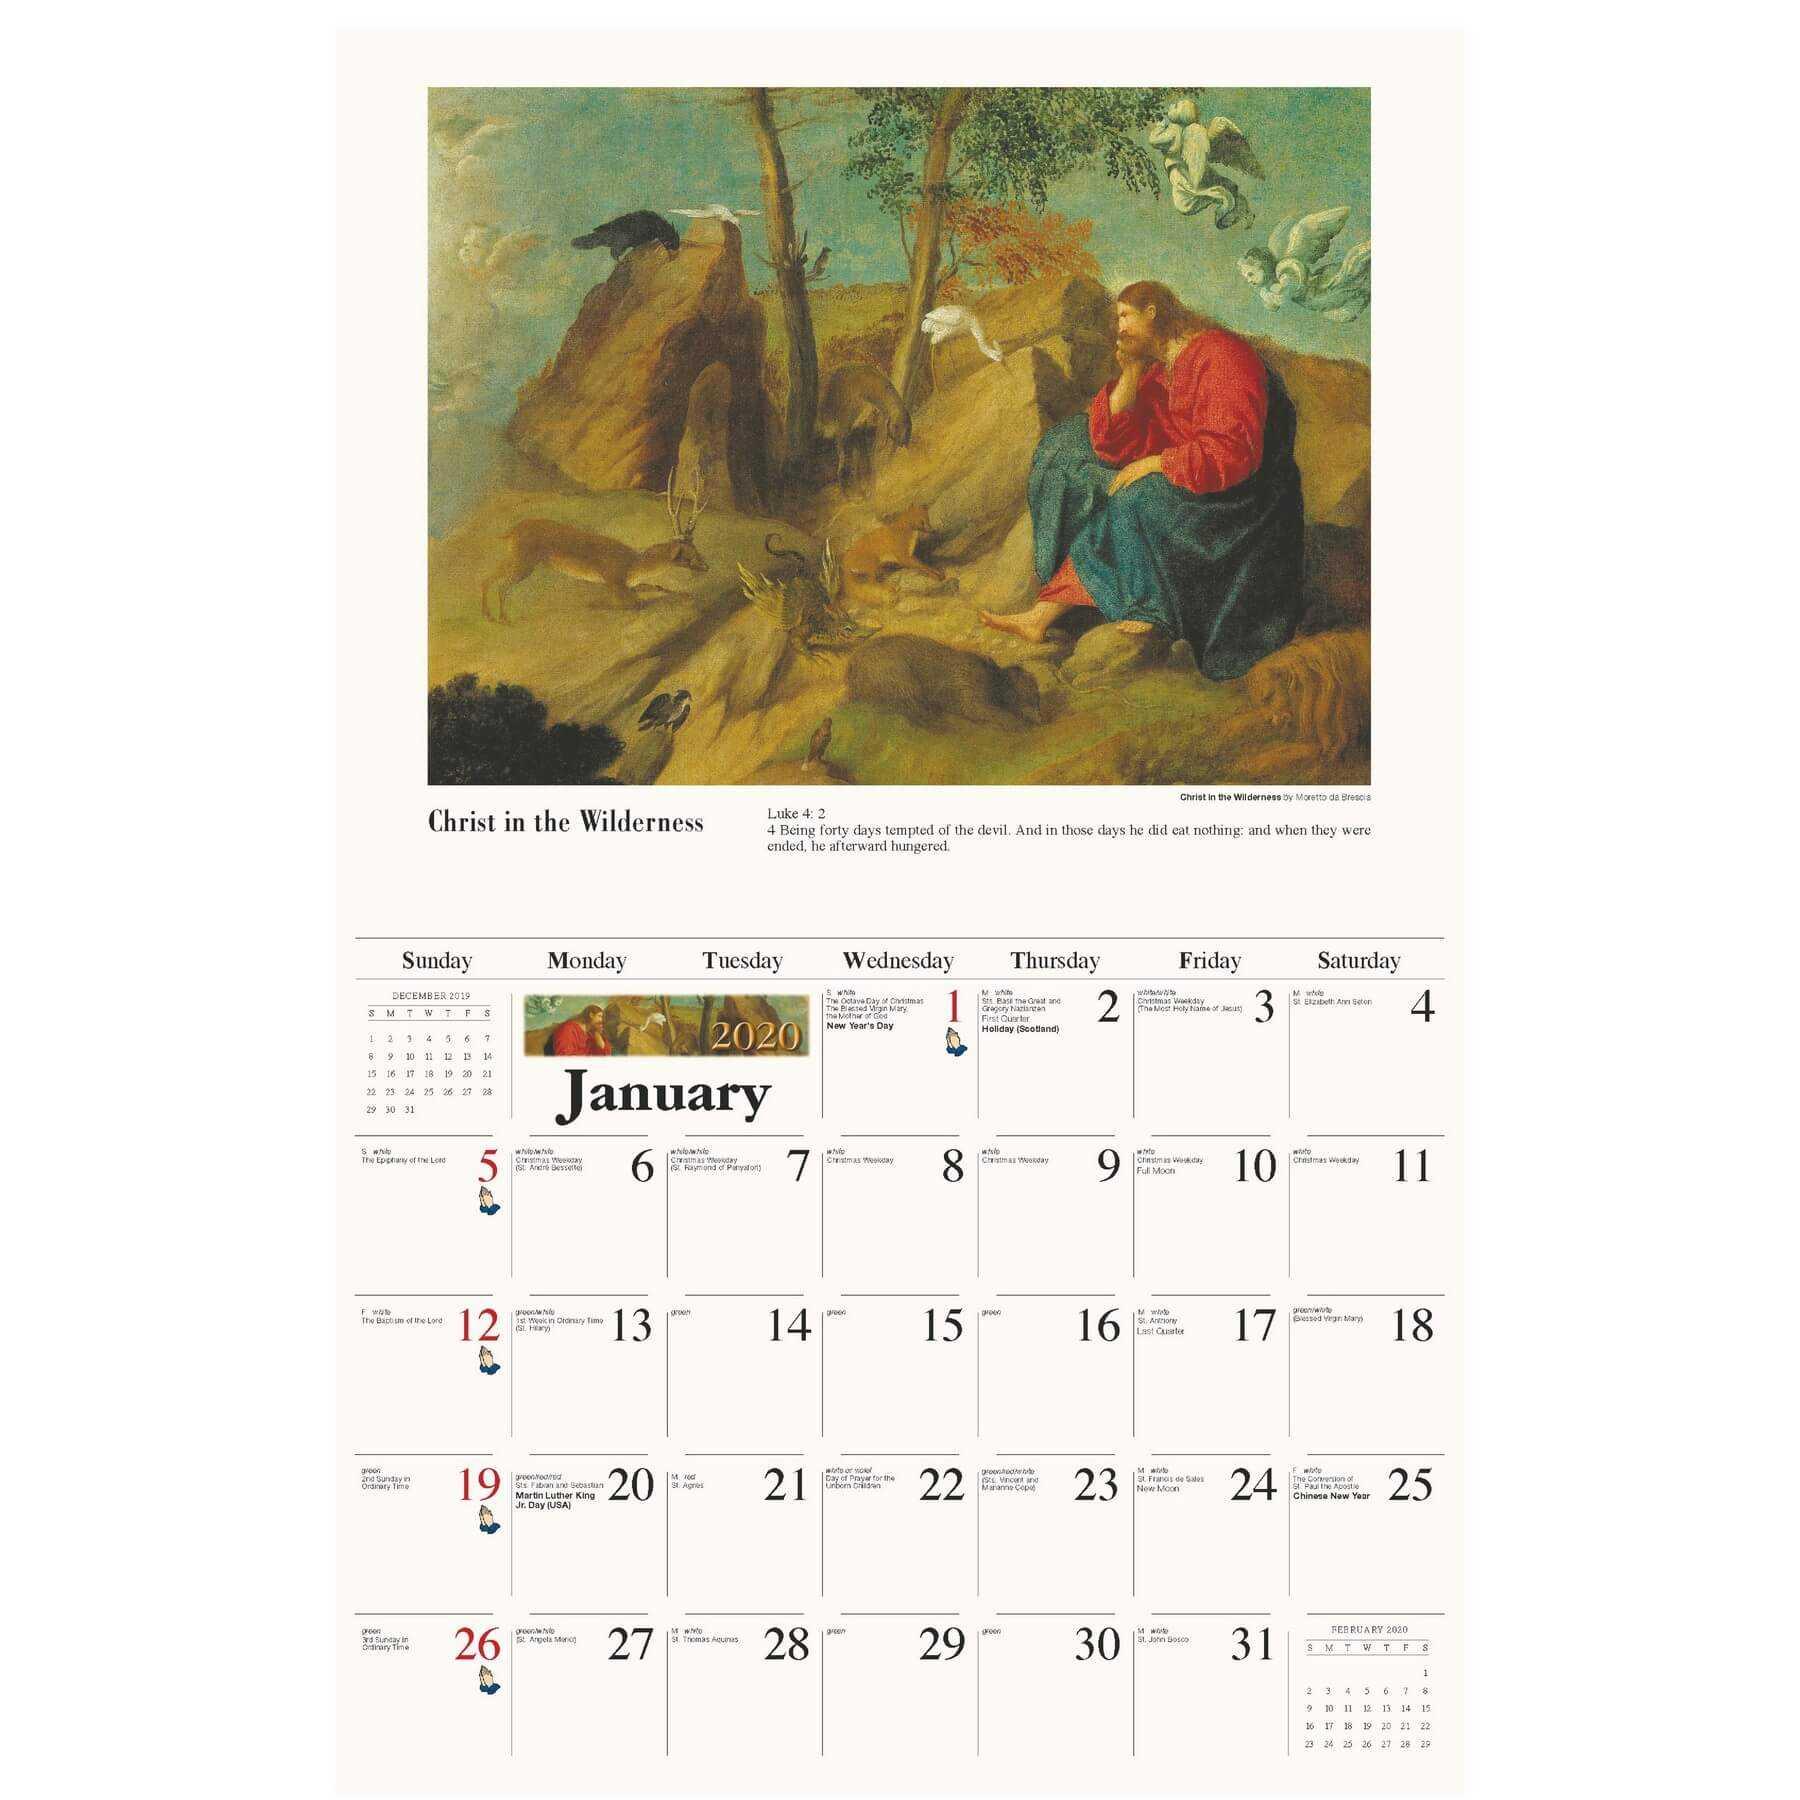 Galleria Wall Calendar 2020 Catholic Inspirations (Eng) for Yrdsb Calendar 2020